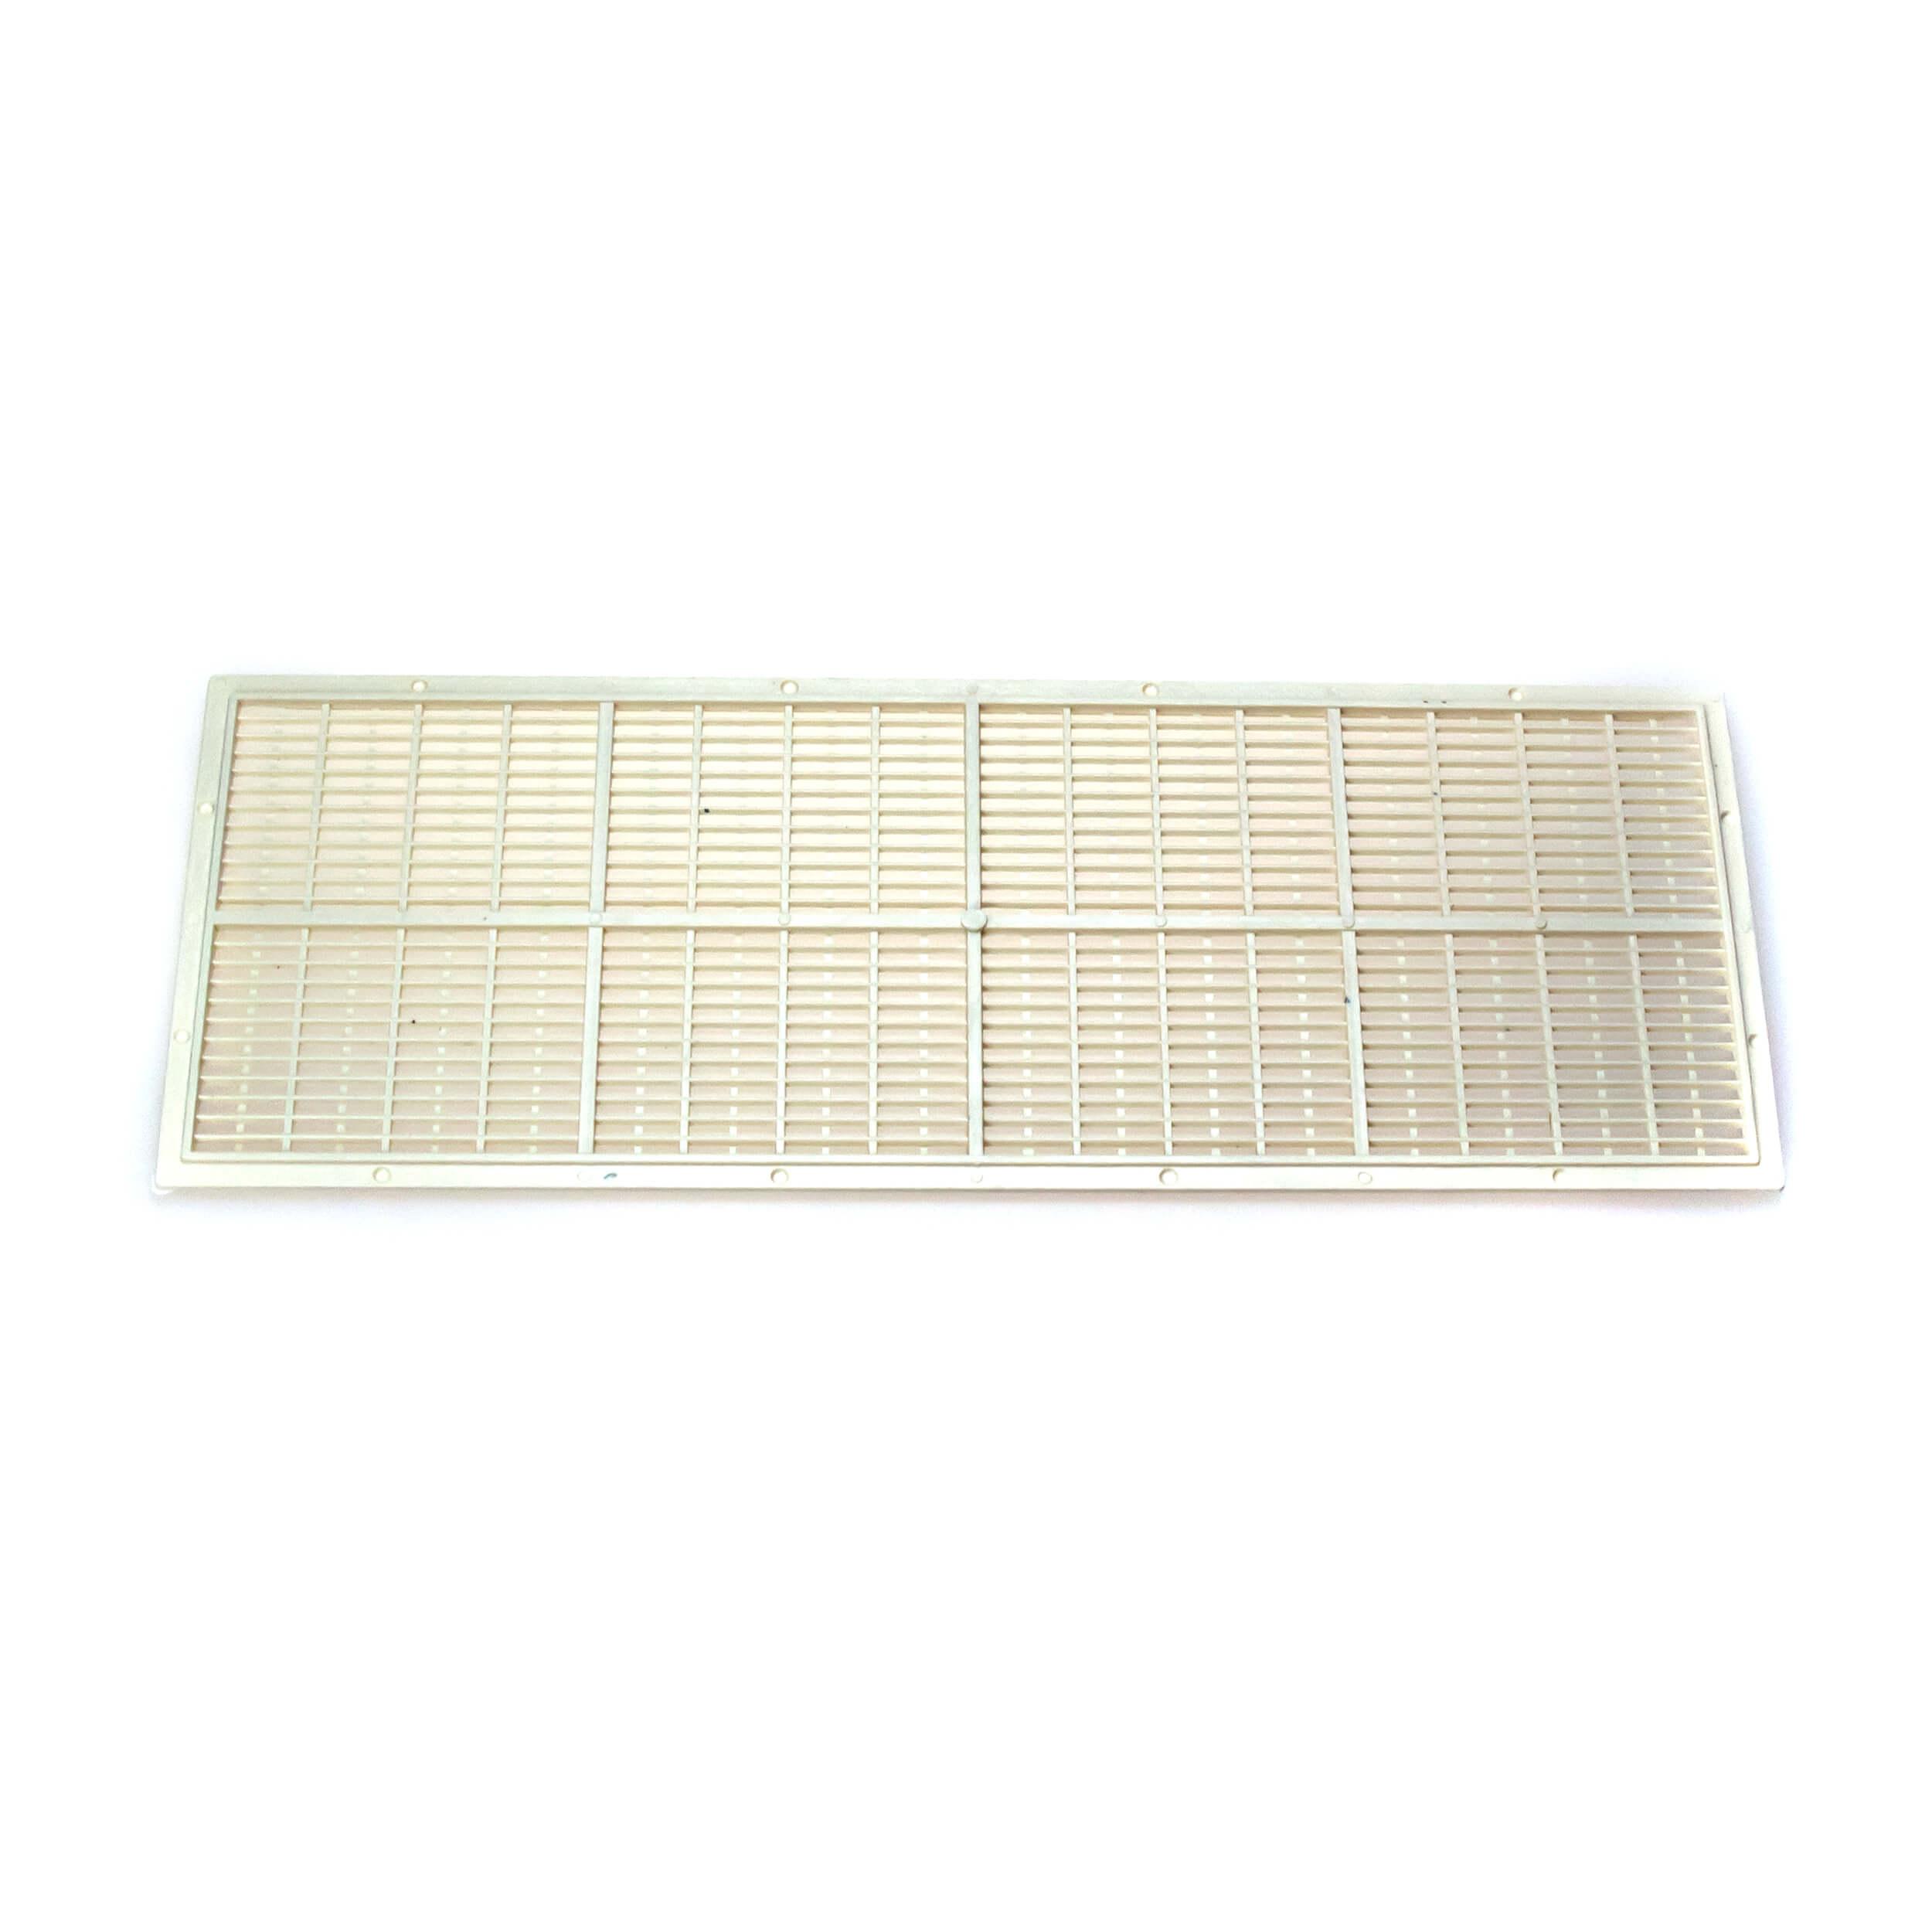 Решетка для сбора пыльцы (403х148х6мм) фото